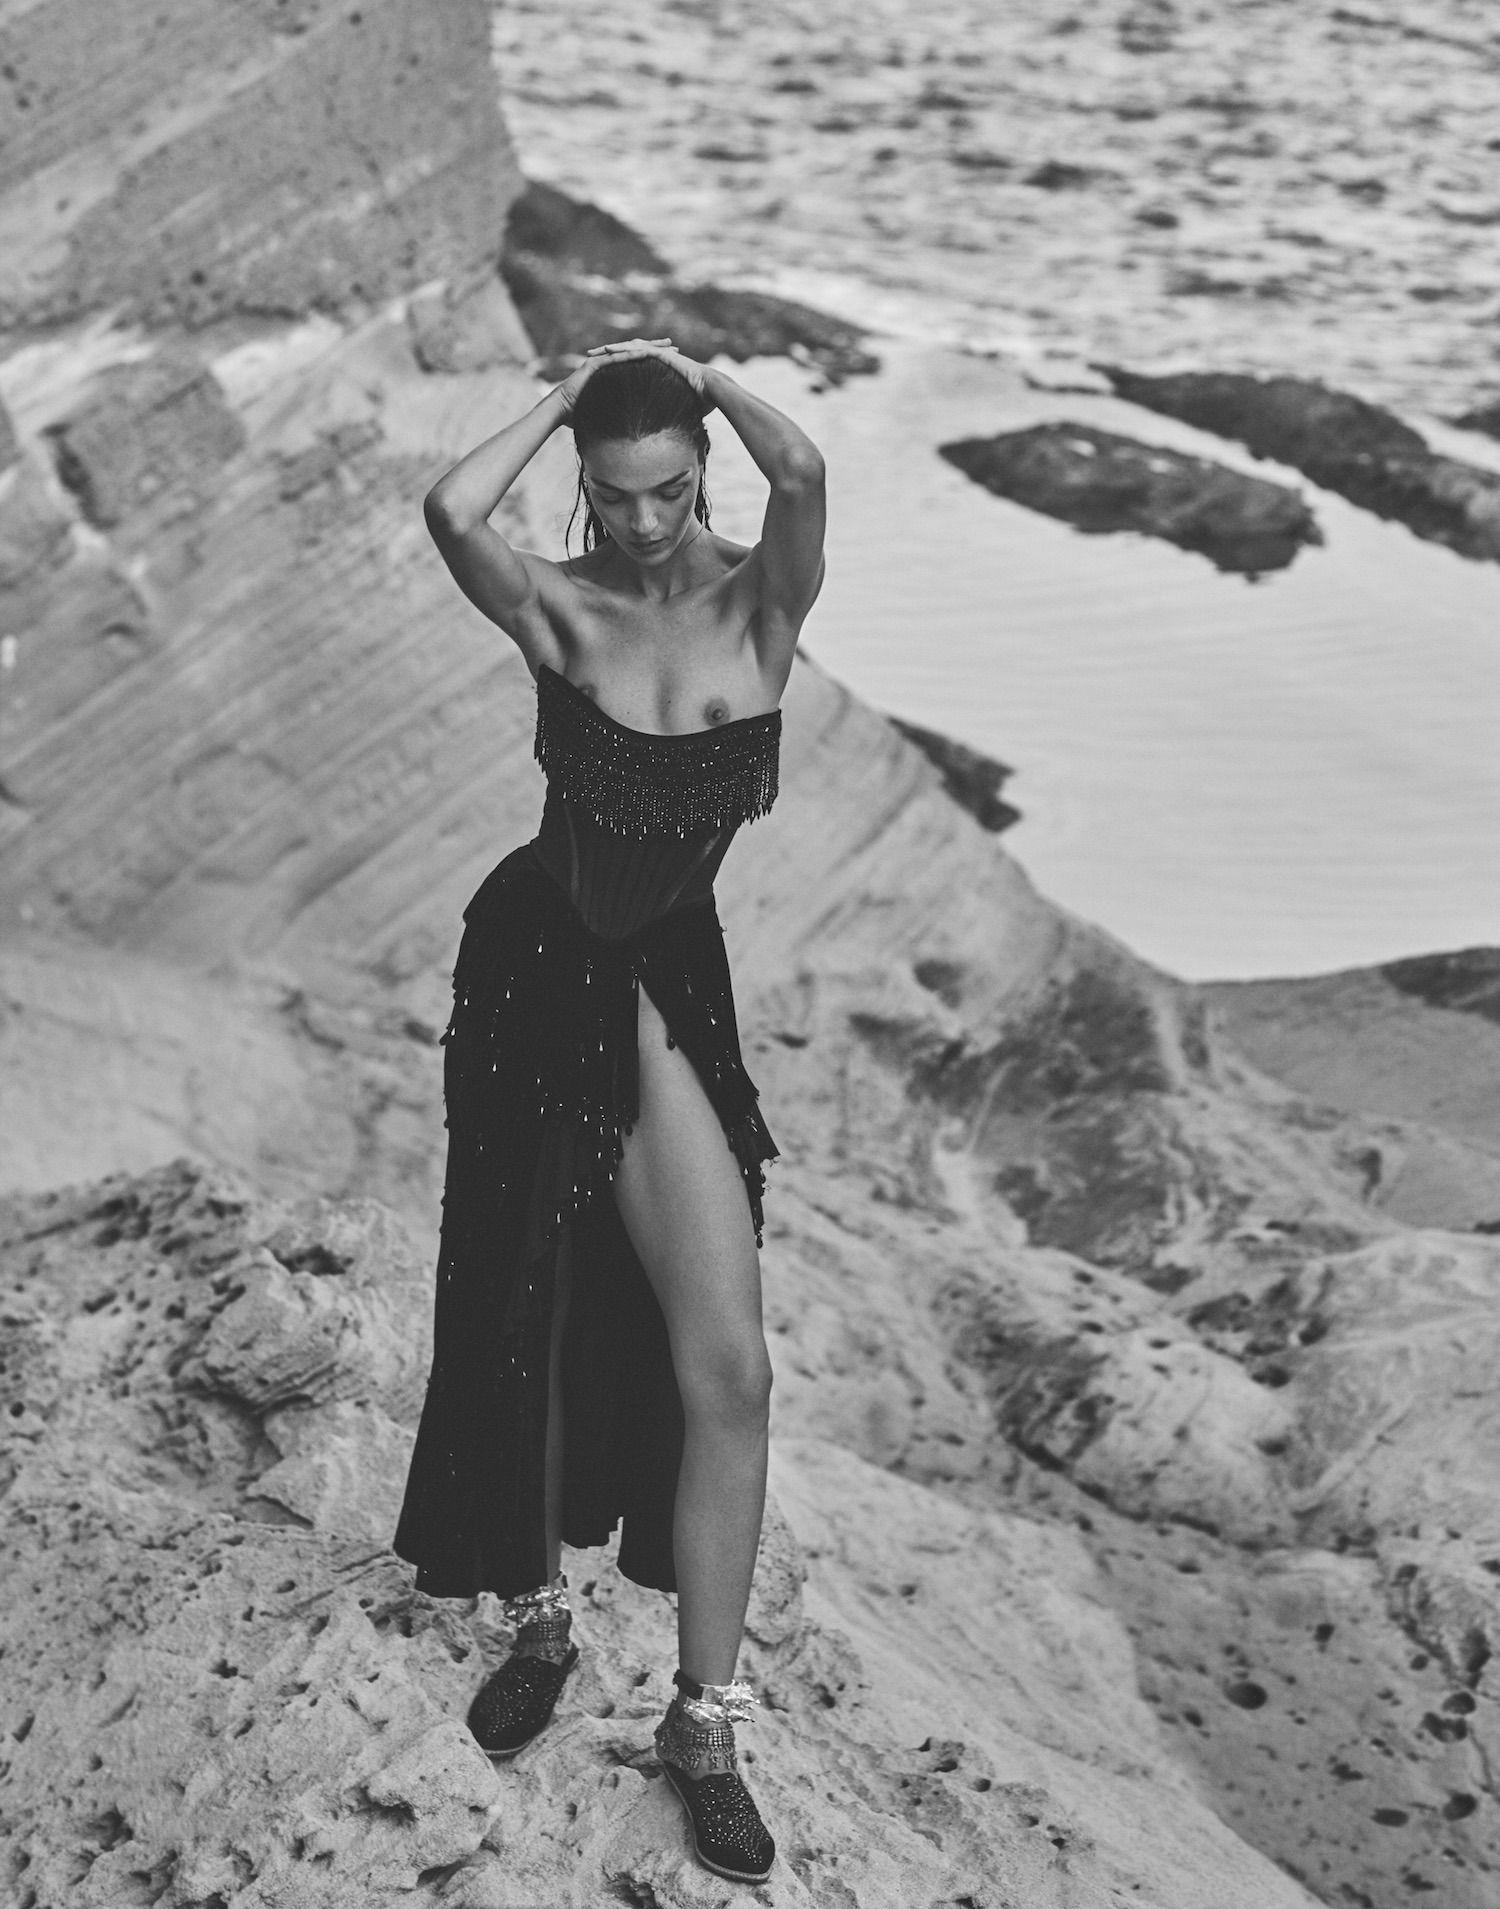 Mariacarla-Boscono-Topless-8